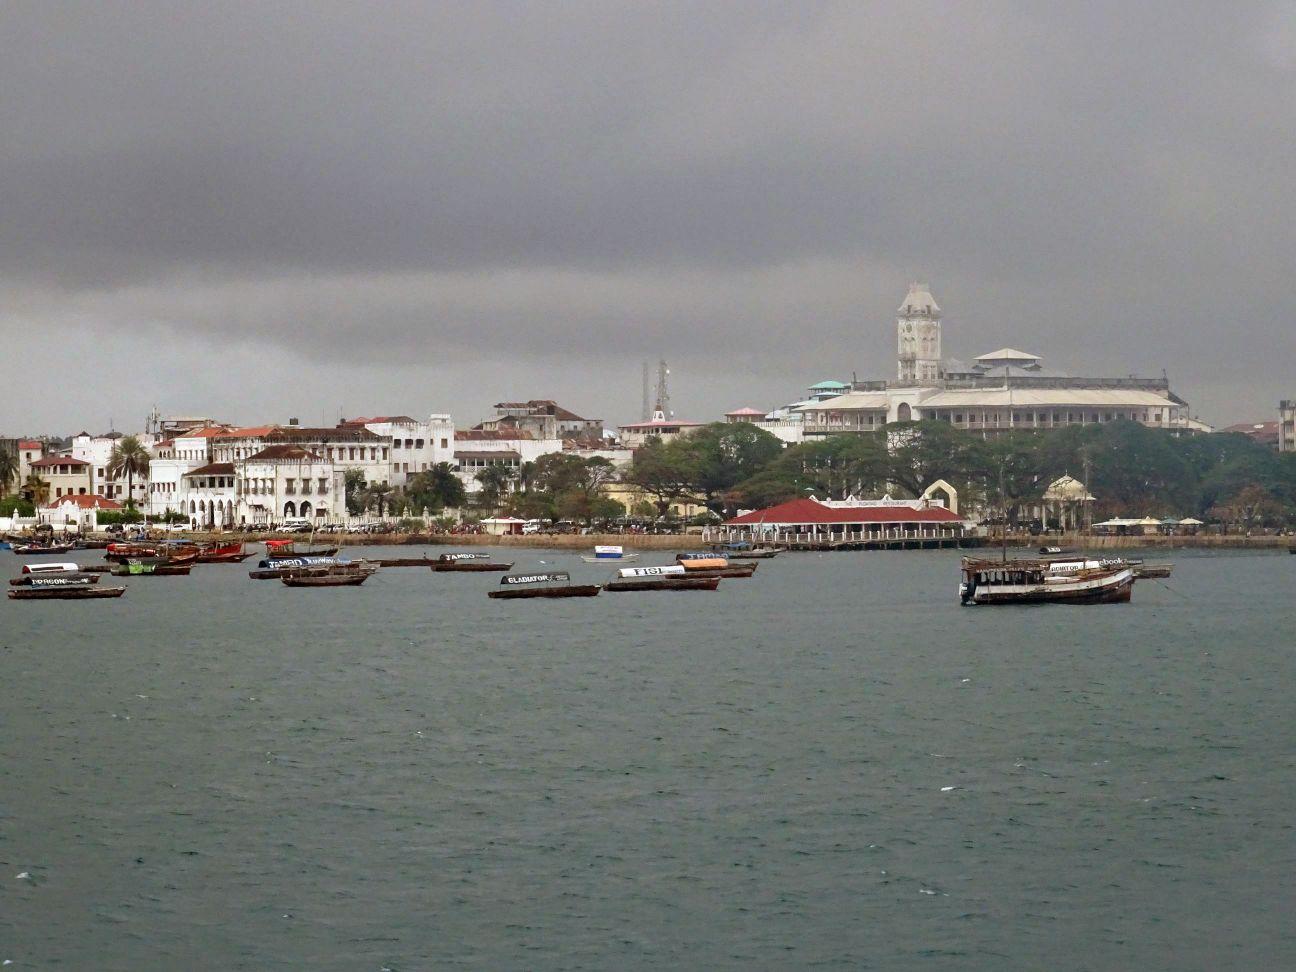 arrival at Stonetown, Zanzibar